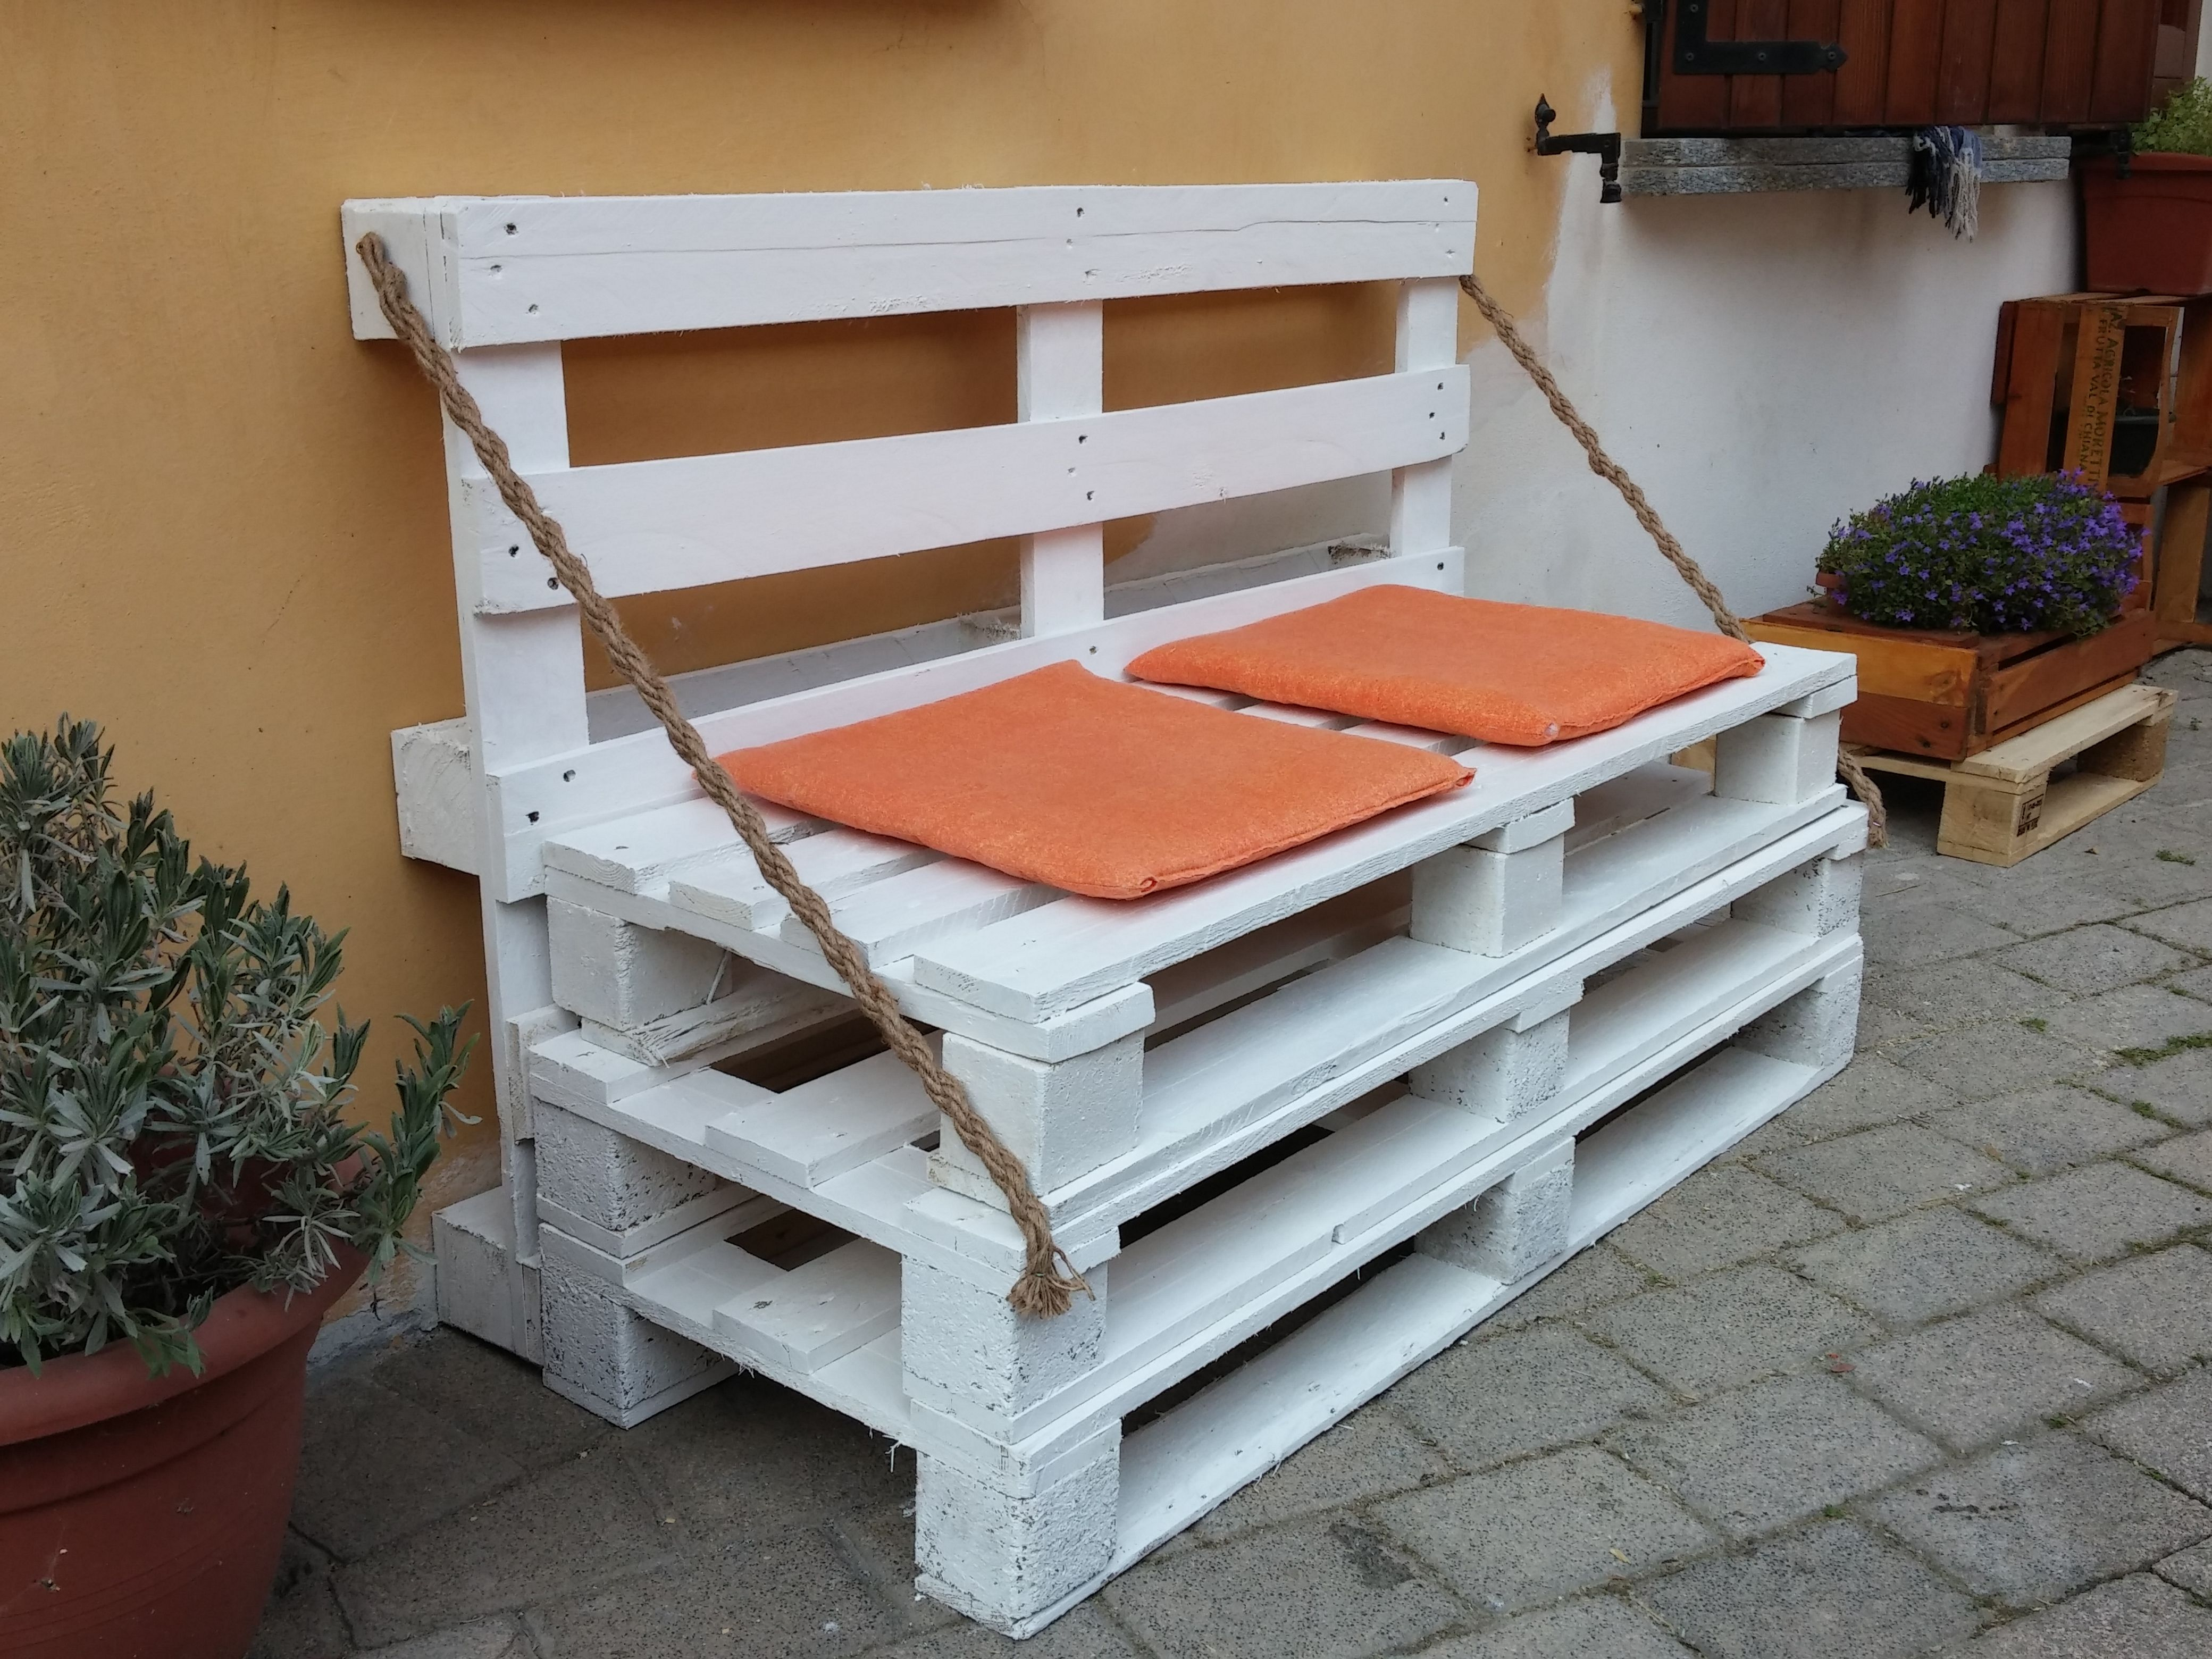 Panchina con 4 pallet colorata e abbellita solo con due - Panchine da interno ...